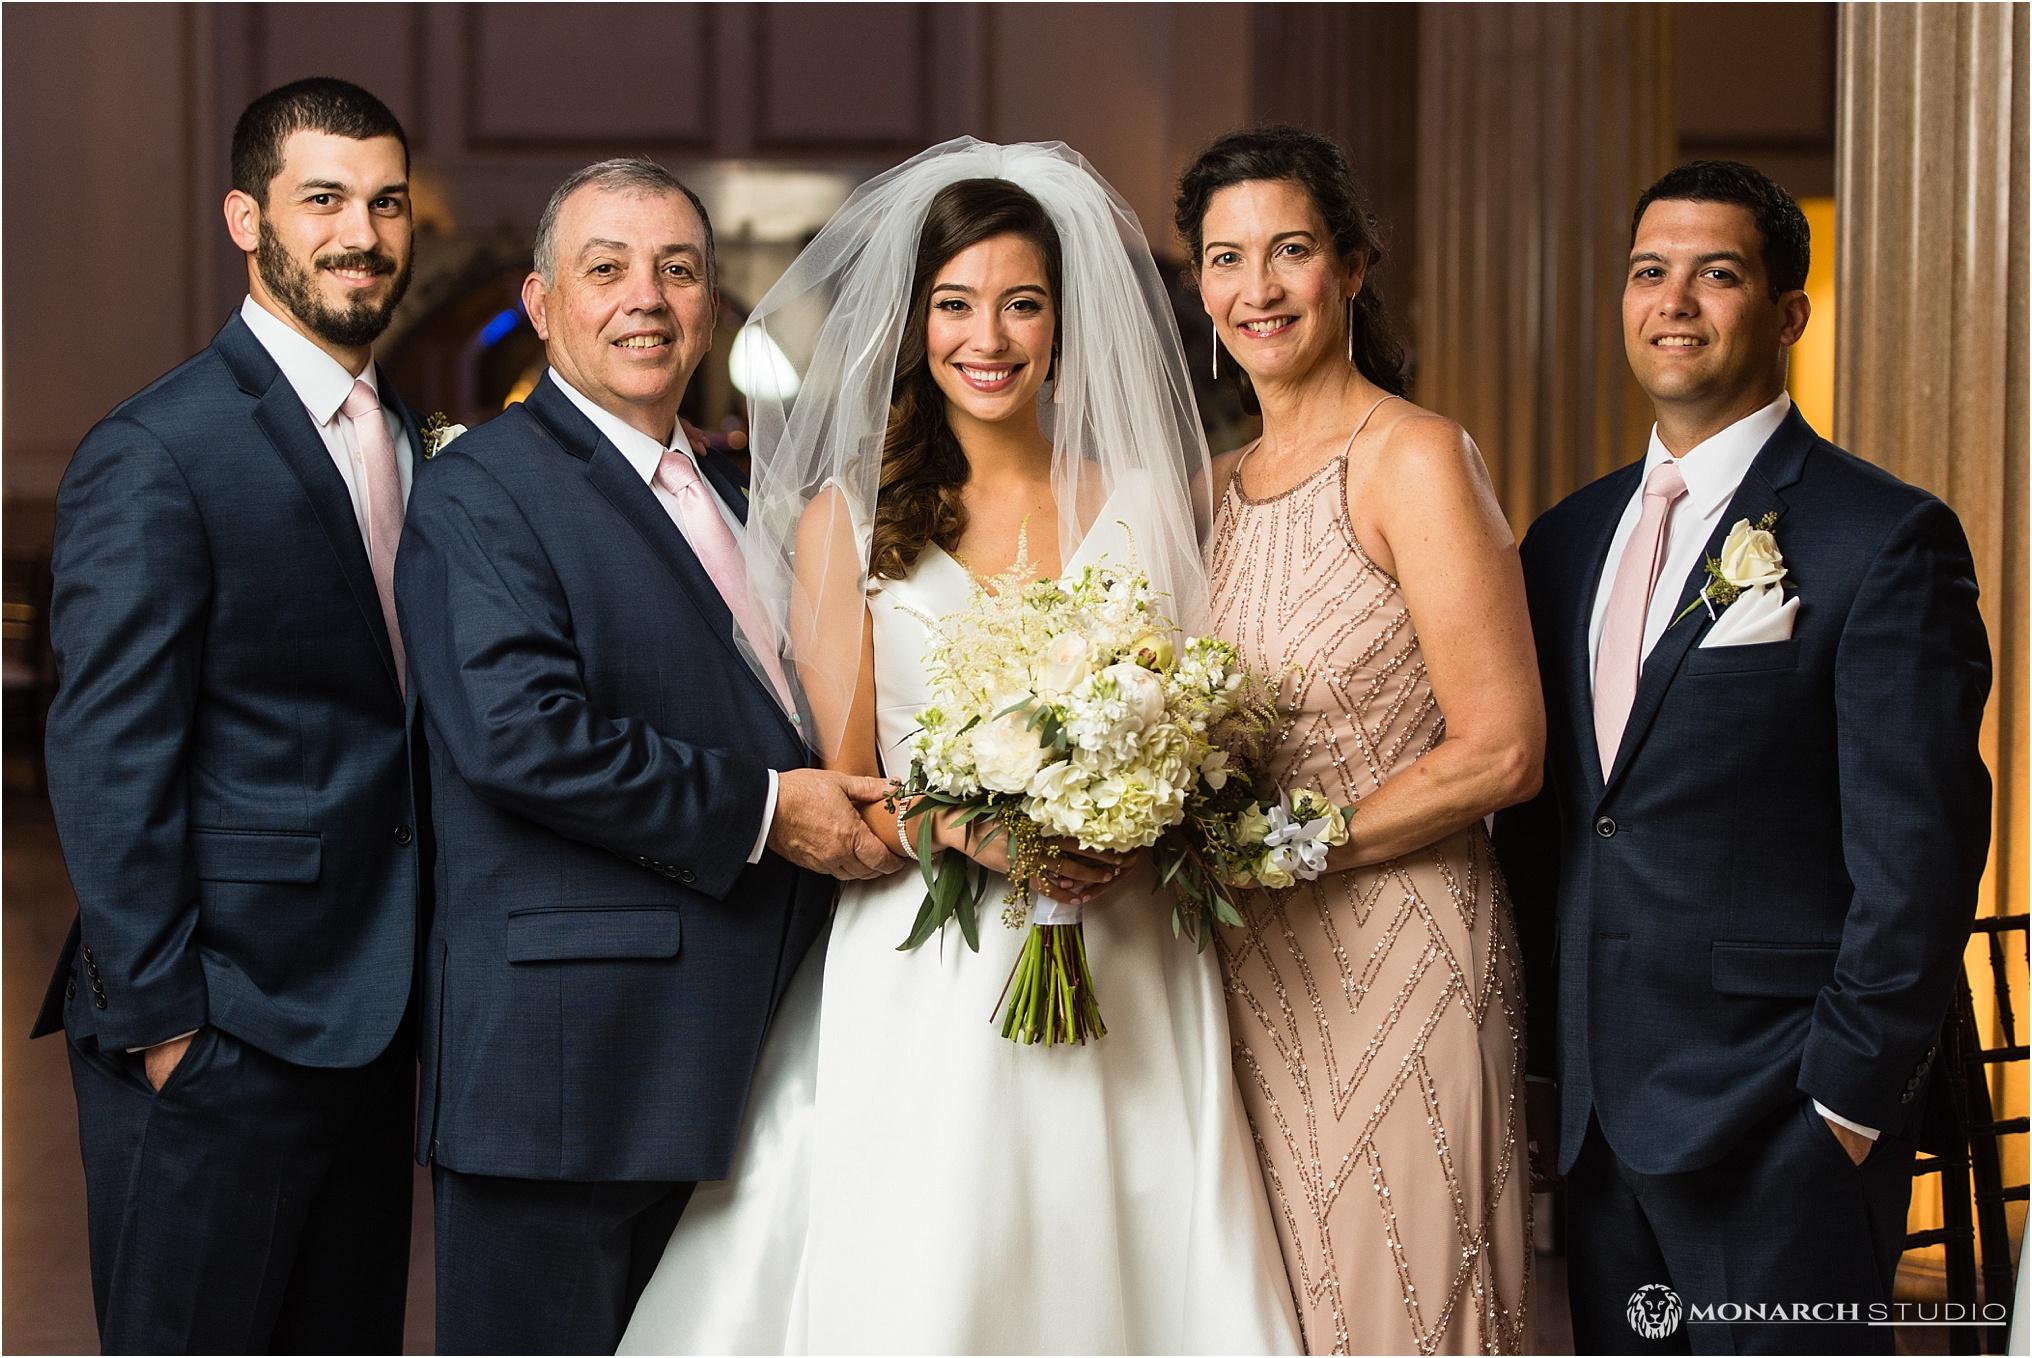 st-augustine-wedding-photographer-028.jpg